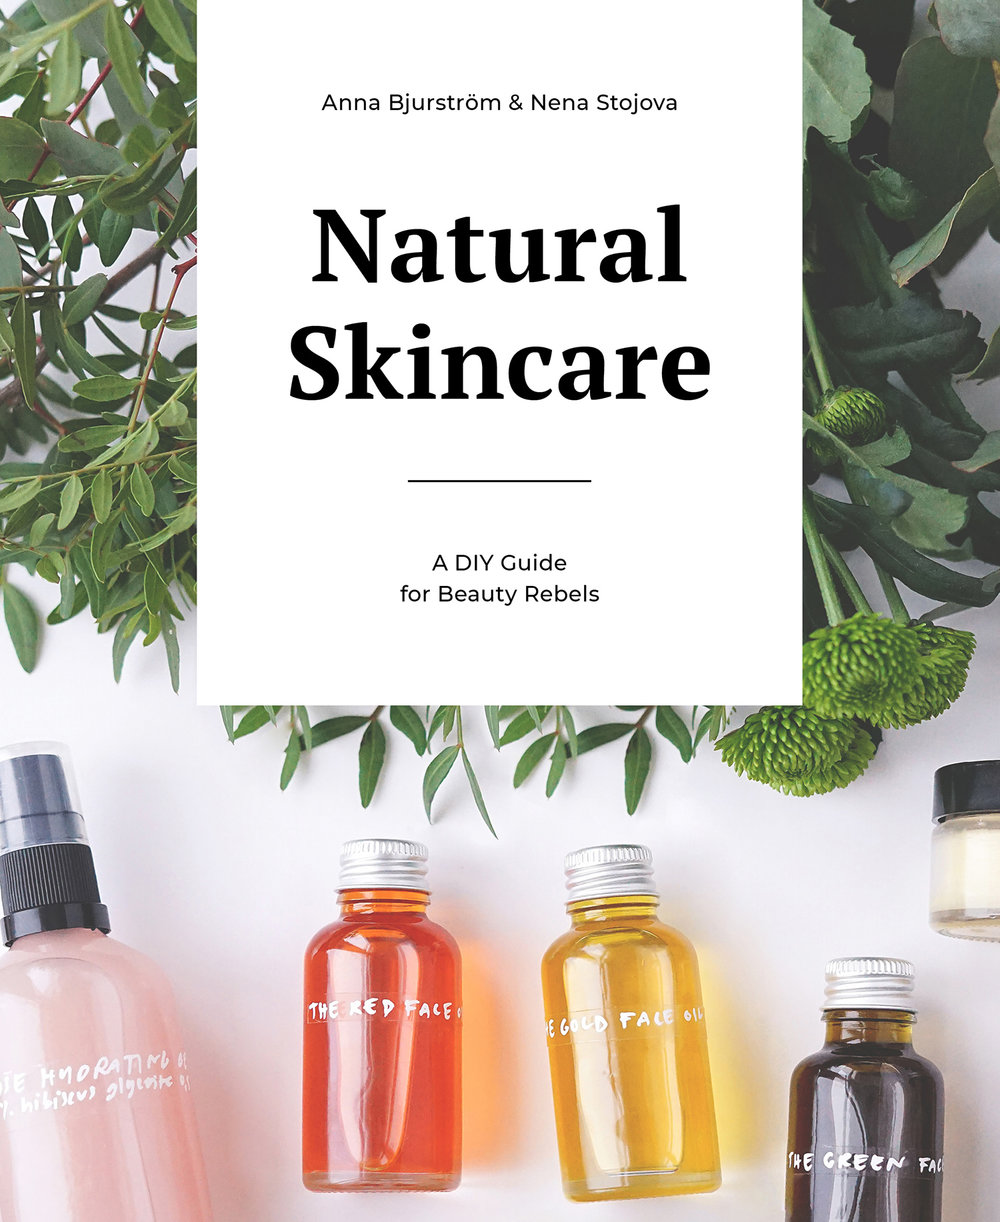 natural-skincare-DIY-guide-for-beauty-rebels-bare-origin-hudvardsverkstan.jpg